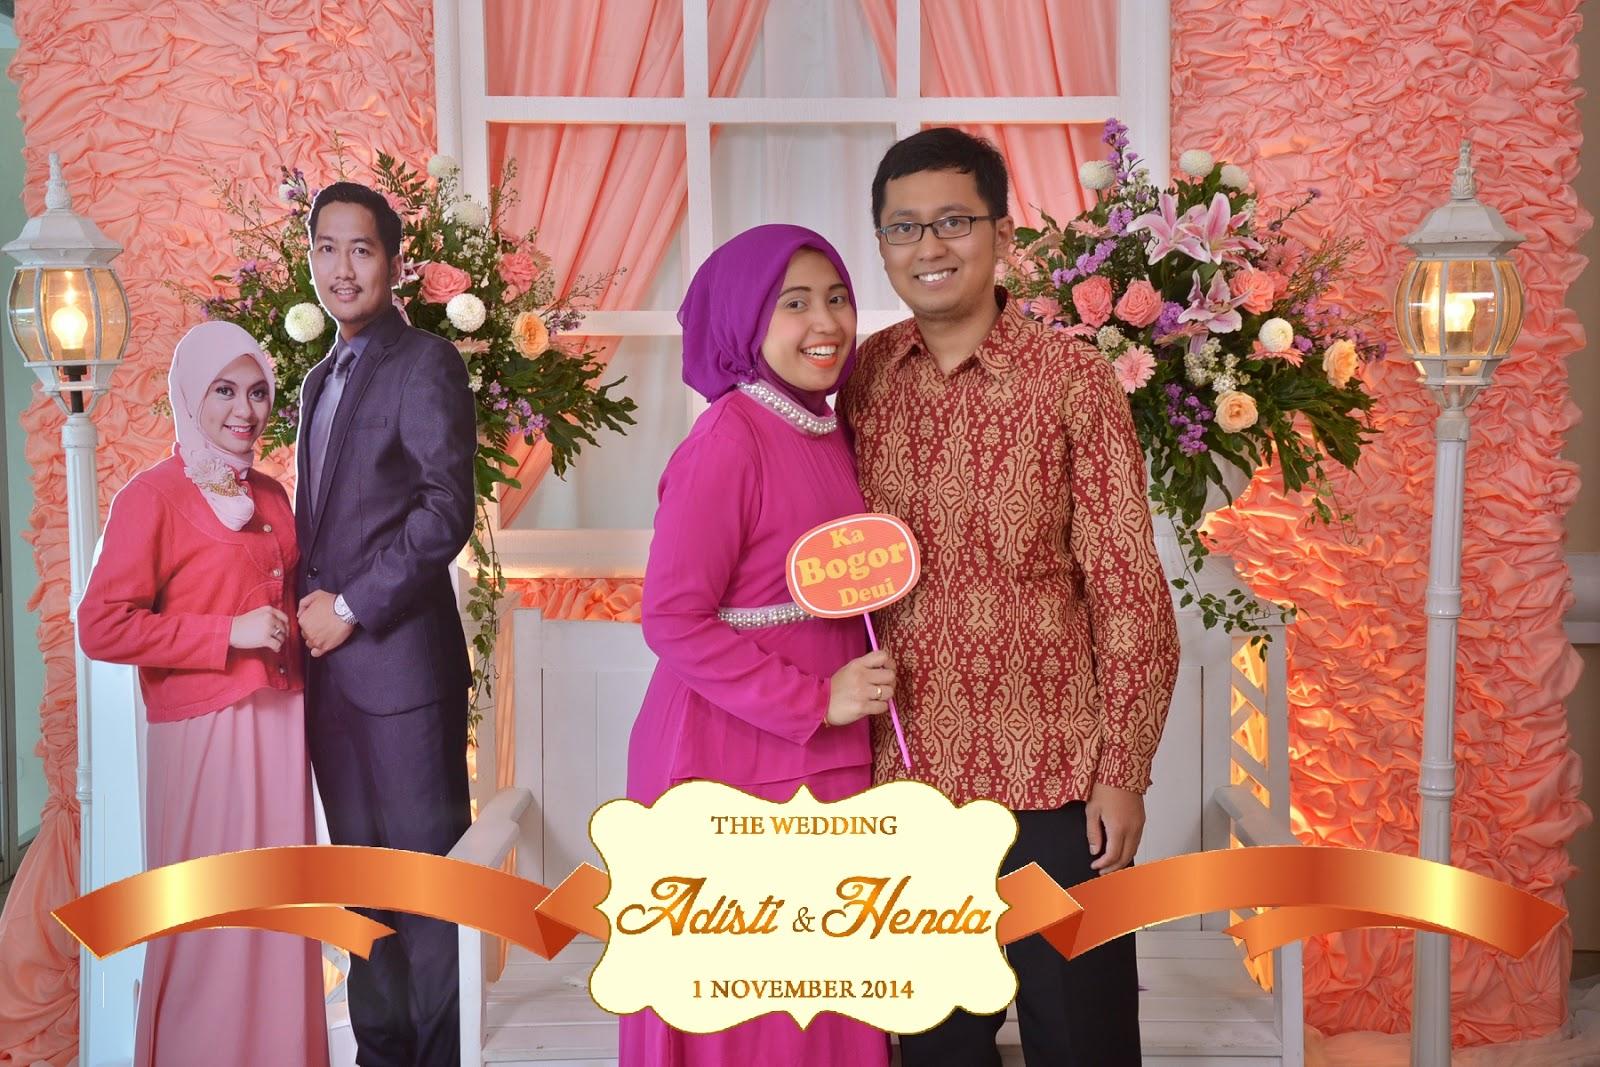 Jasa Photo Booth Souvenir di Jakarta Untuk Event Wedding